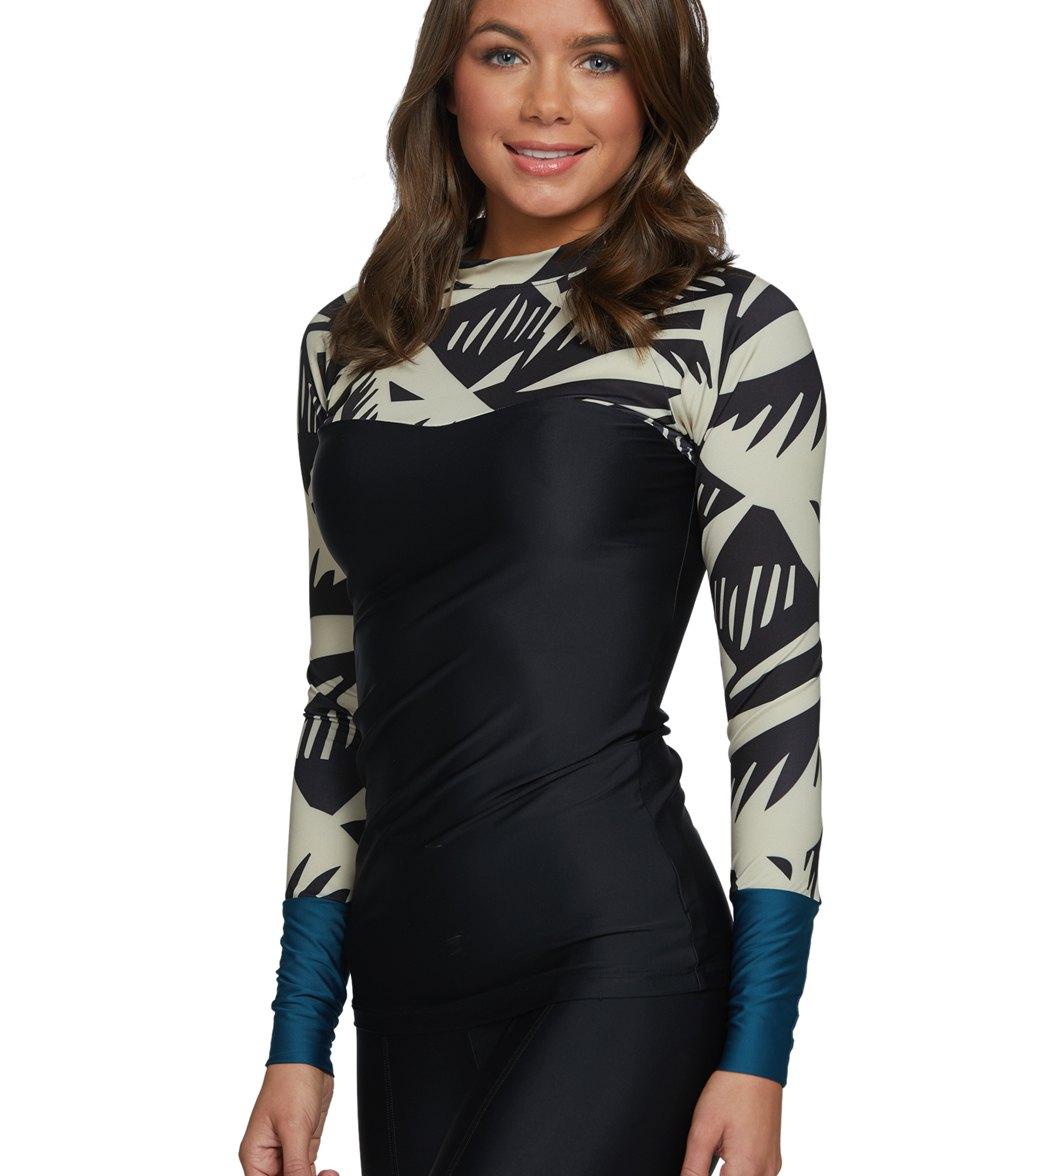 be2fc210cabf8 Seea Hermosa Buzios Swim Shirt at SwimOutlet.com - Free Shipping